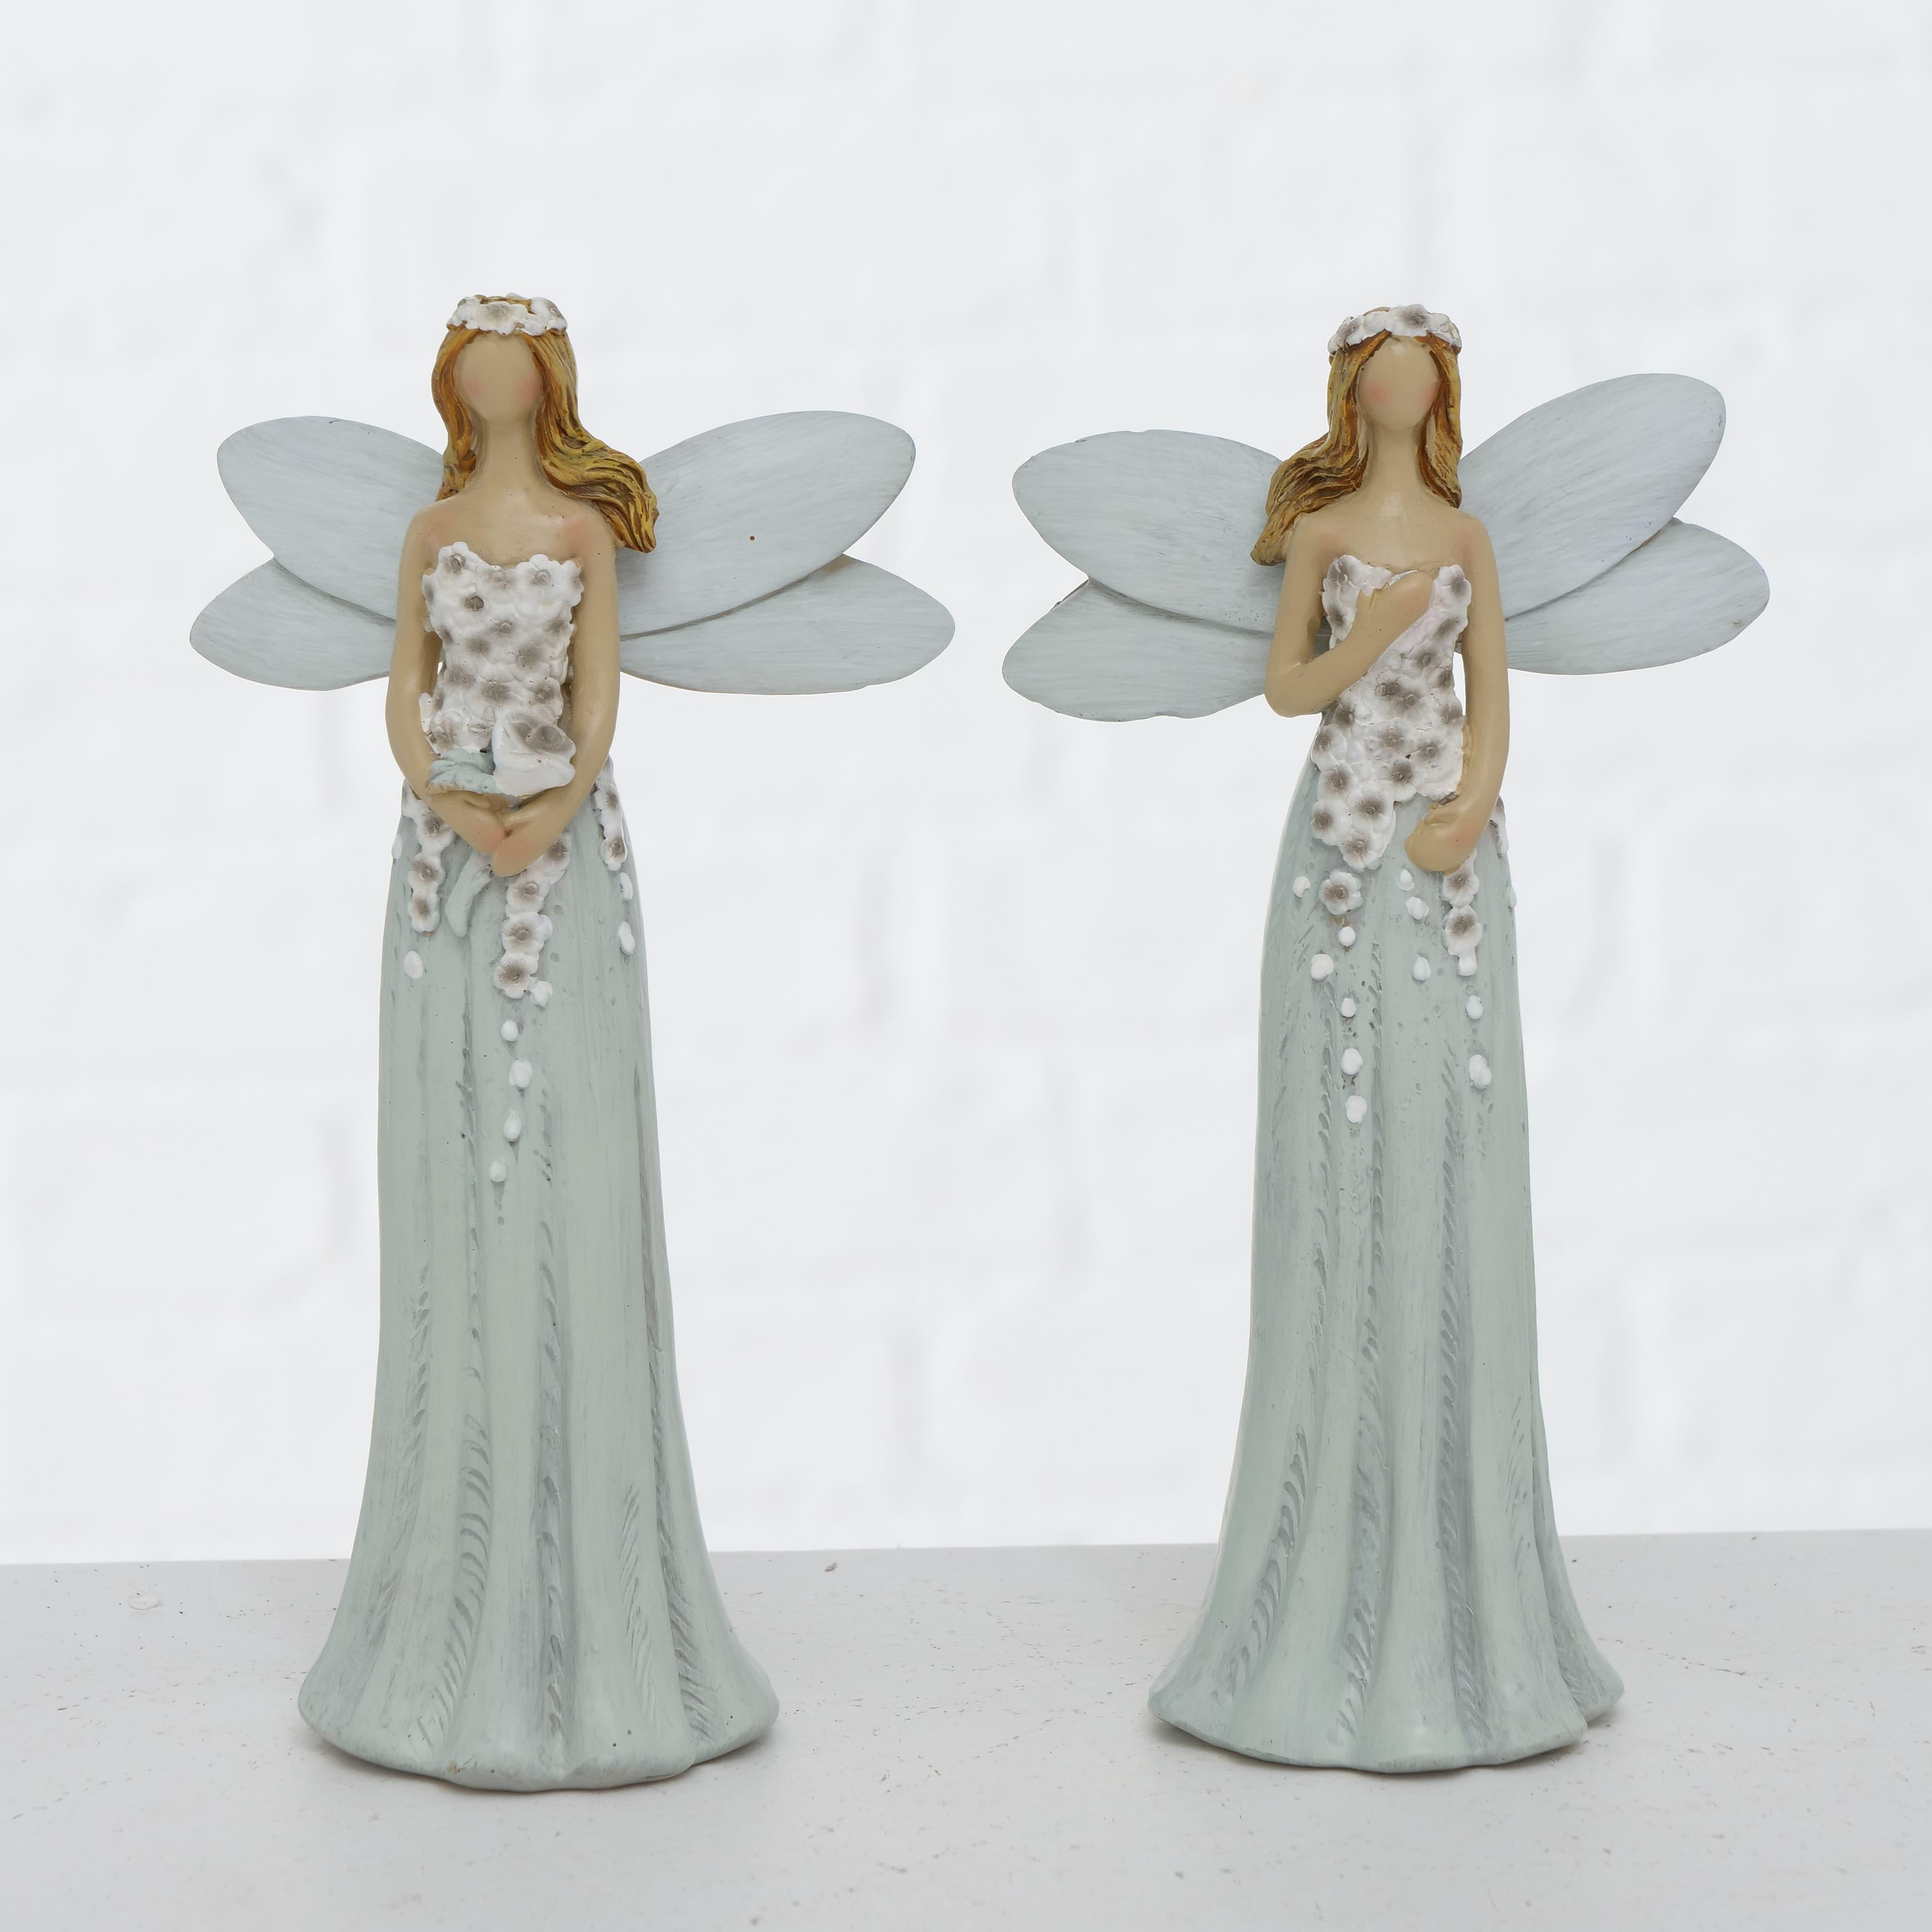 Figurina decorativa din polirasina Elysa Gri / Alb, Modele Asortate, l9xA5xH16,5 cm poza